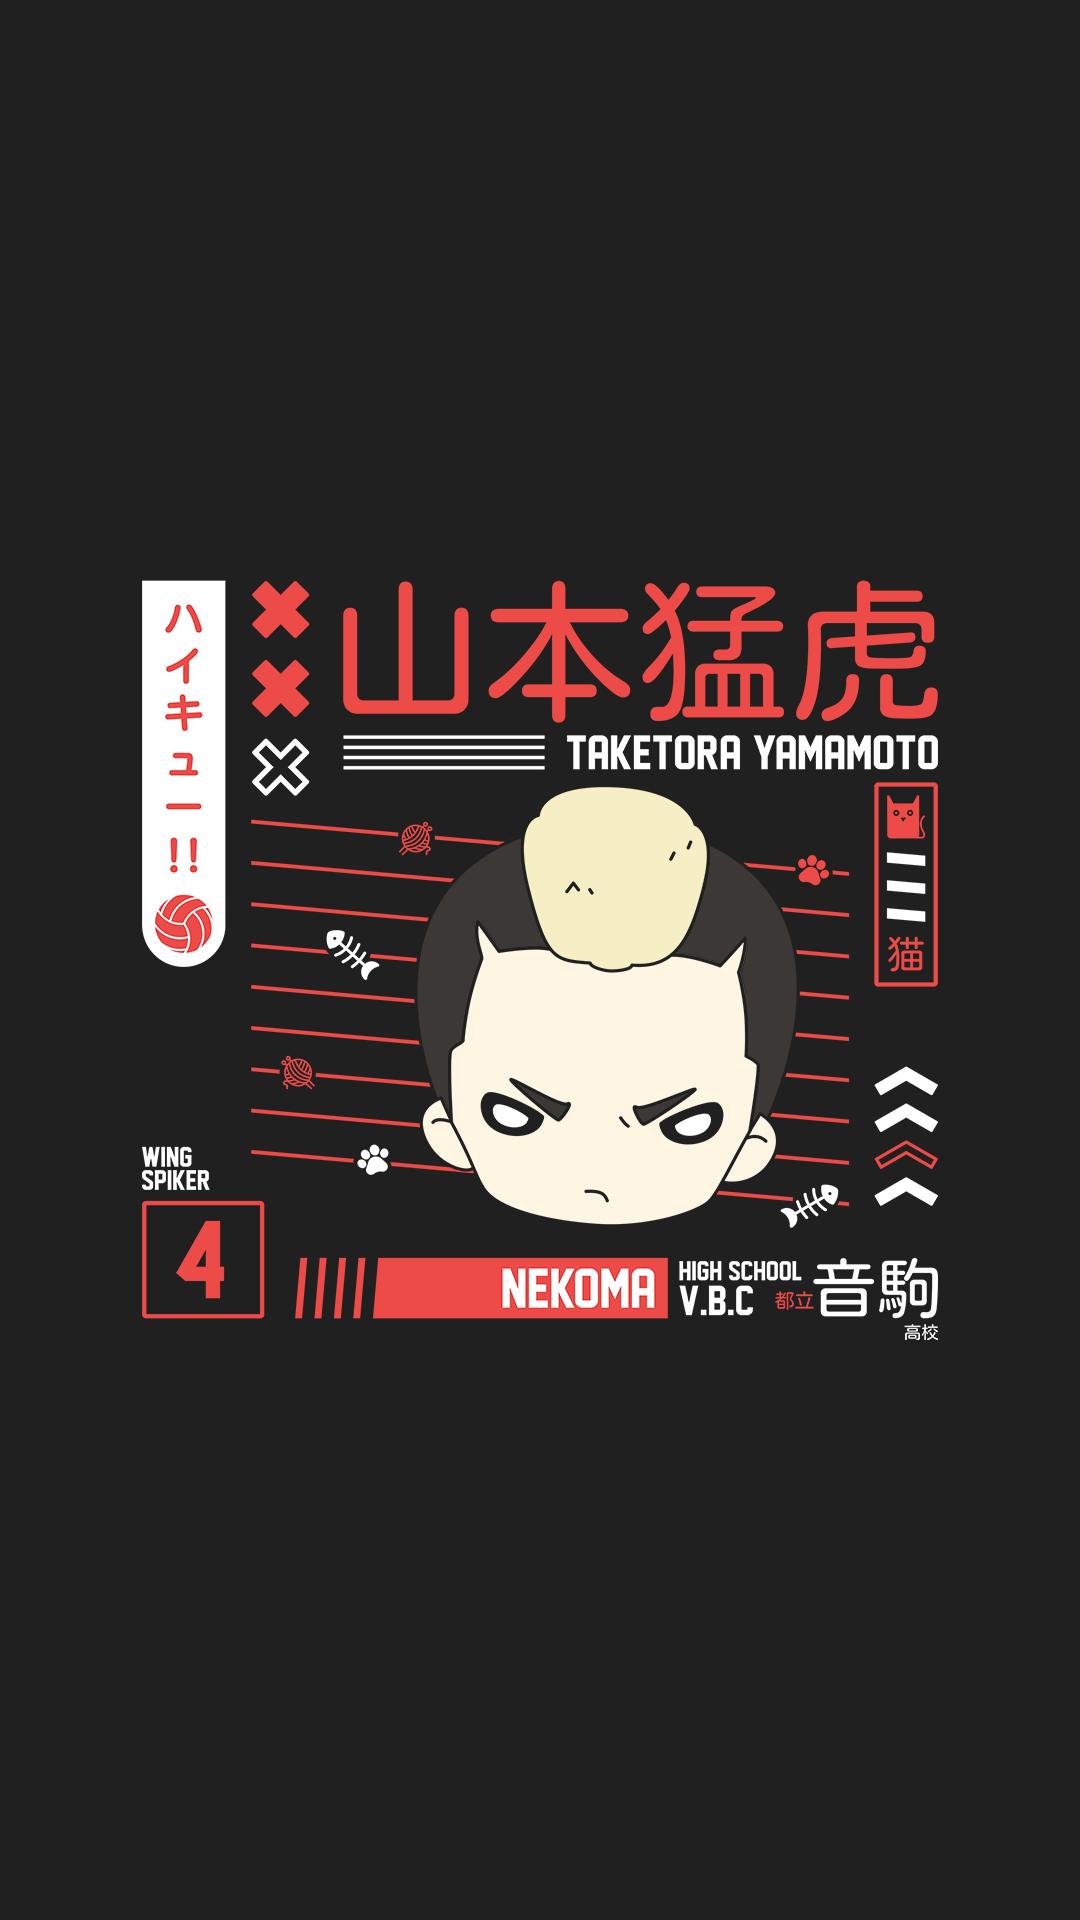 Taketora Yamamoto Wallpaper - Nekoma - Haikyuu